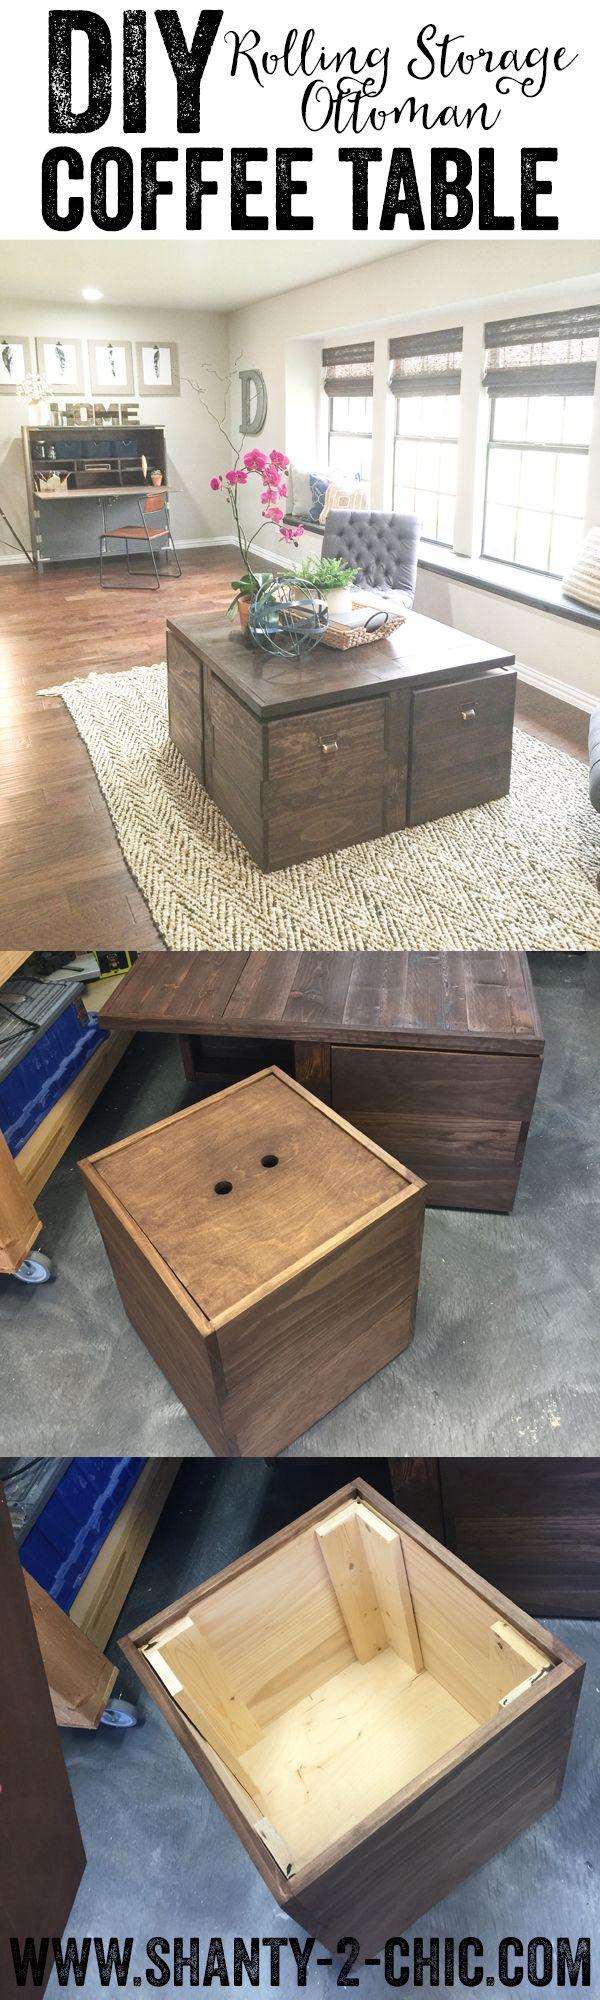 Rolling Ottoman Coffee Table.Diy Rolling Storage Ottoman Coffee Table Organize Storage